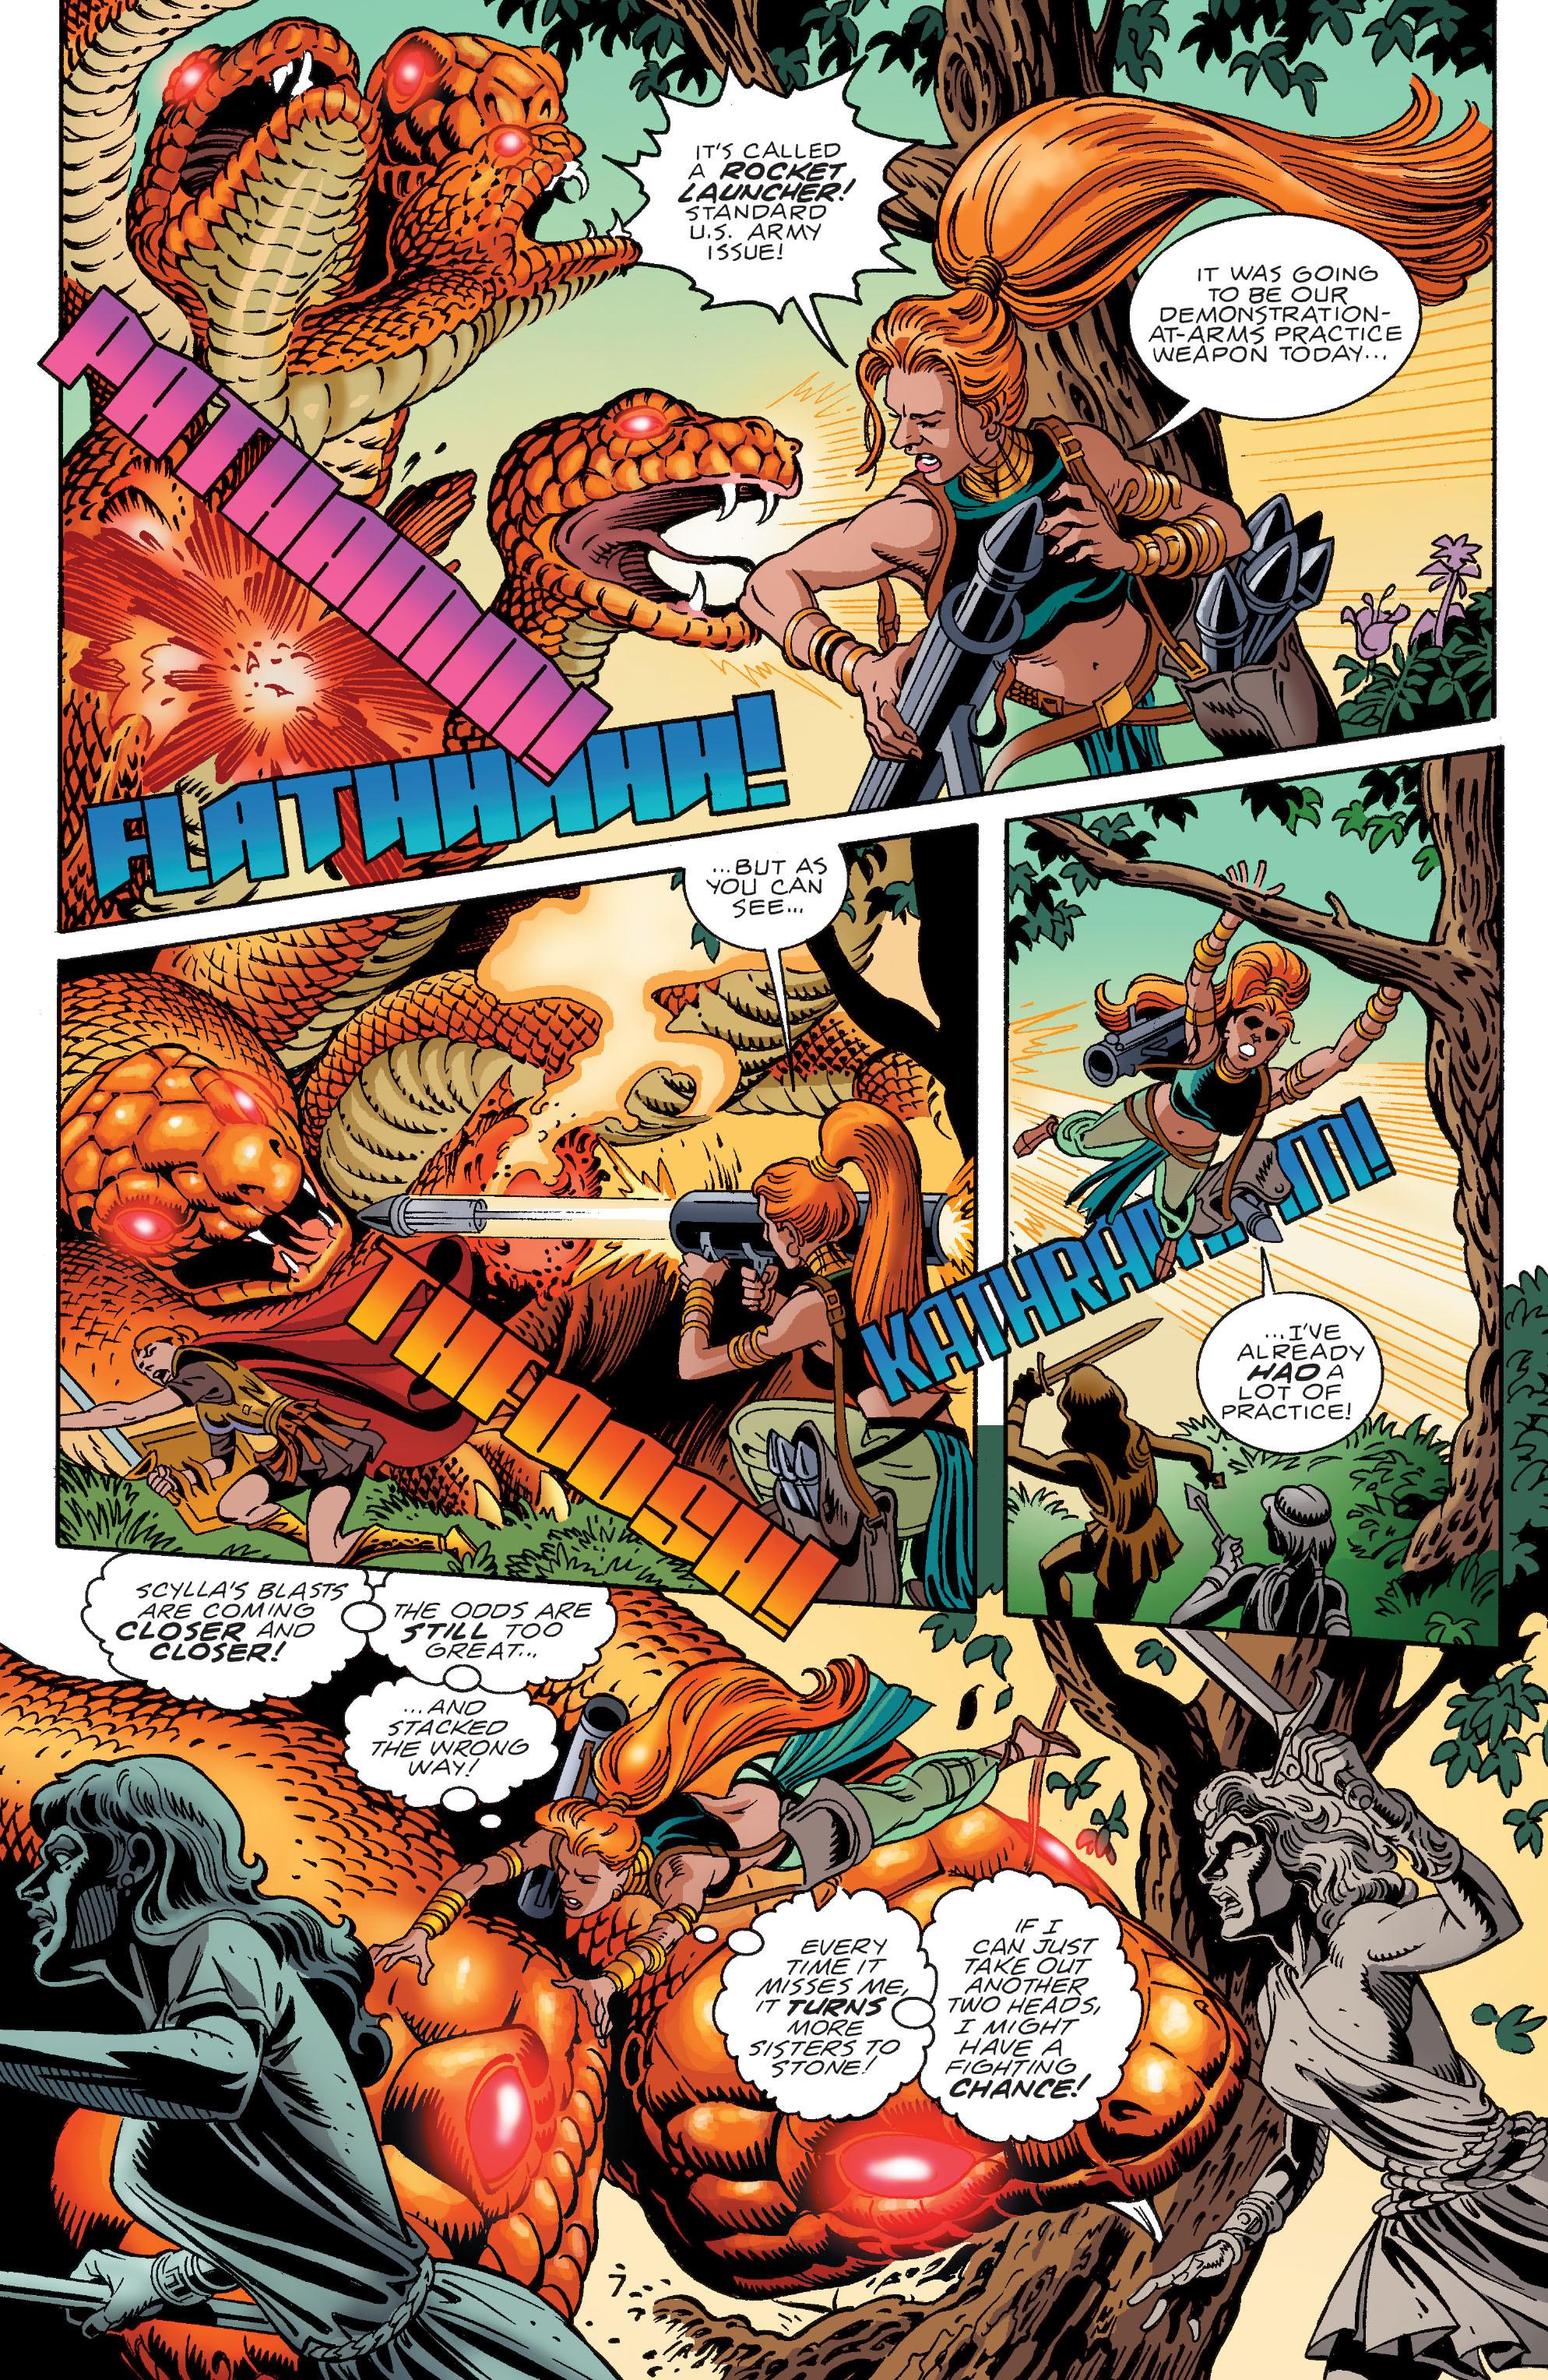 Read online Wonder Woman (1987) comic -  Issue #191 - 7